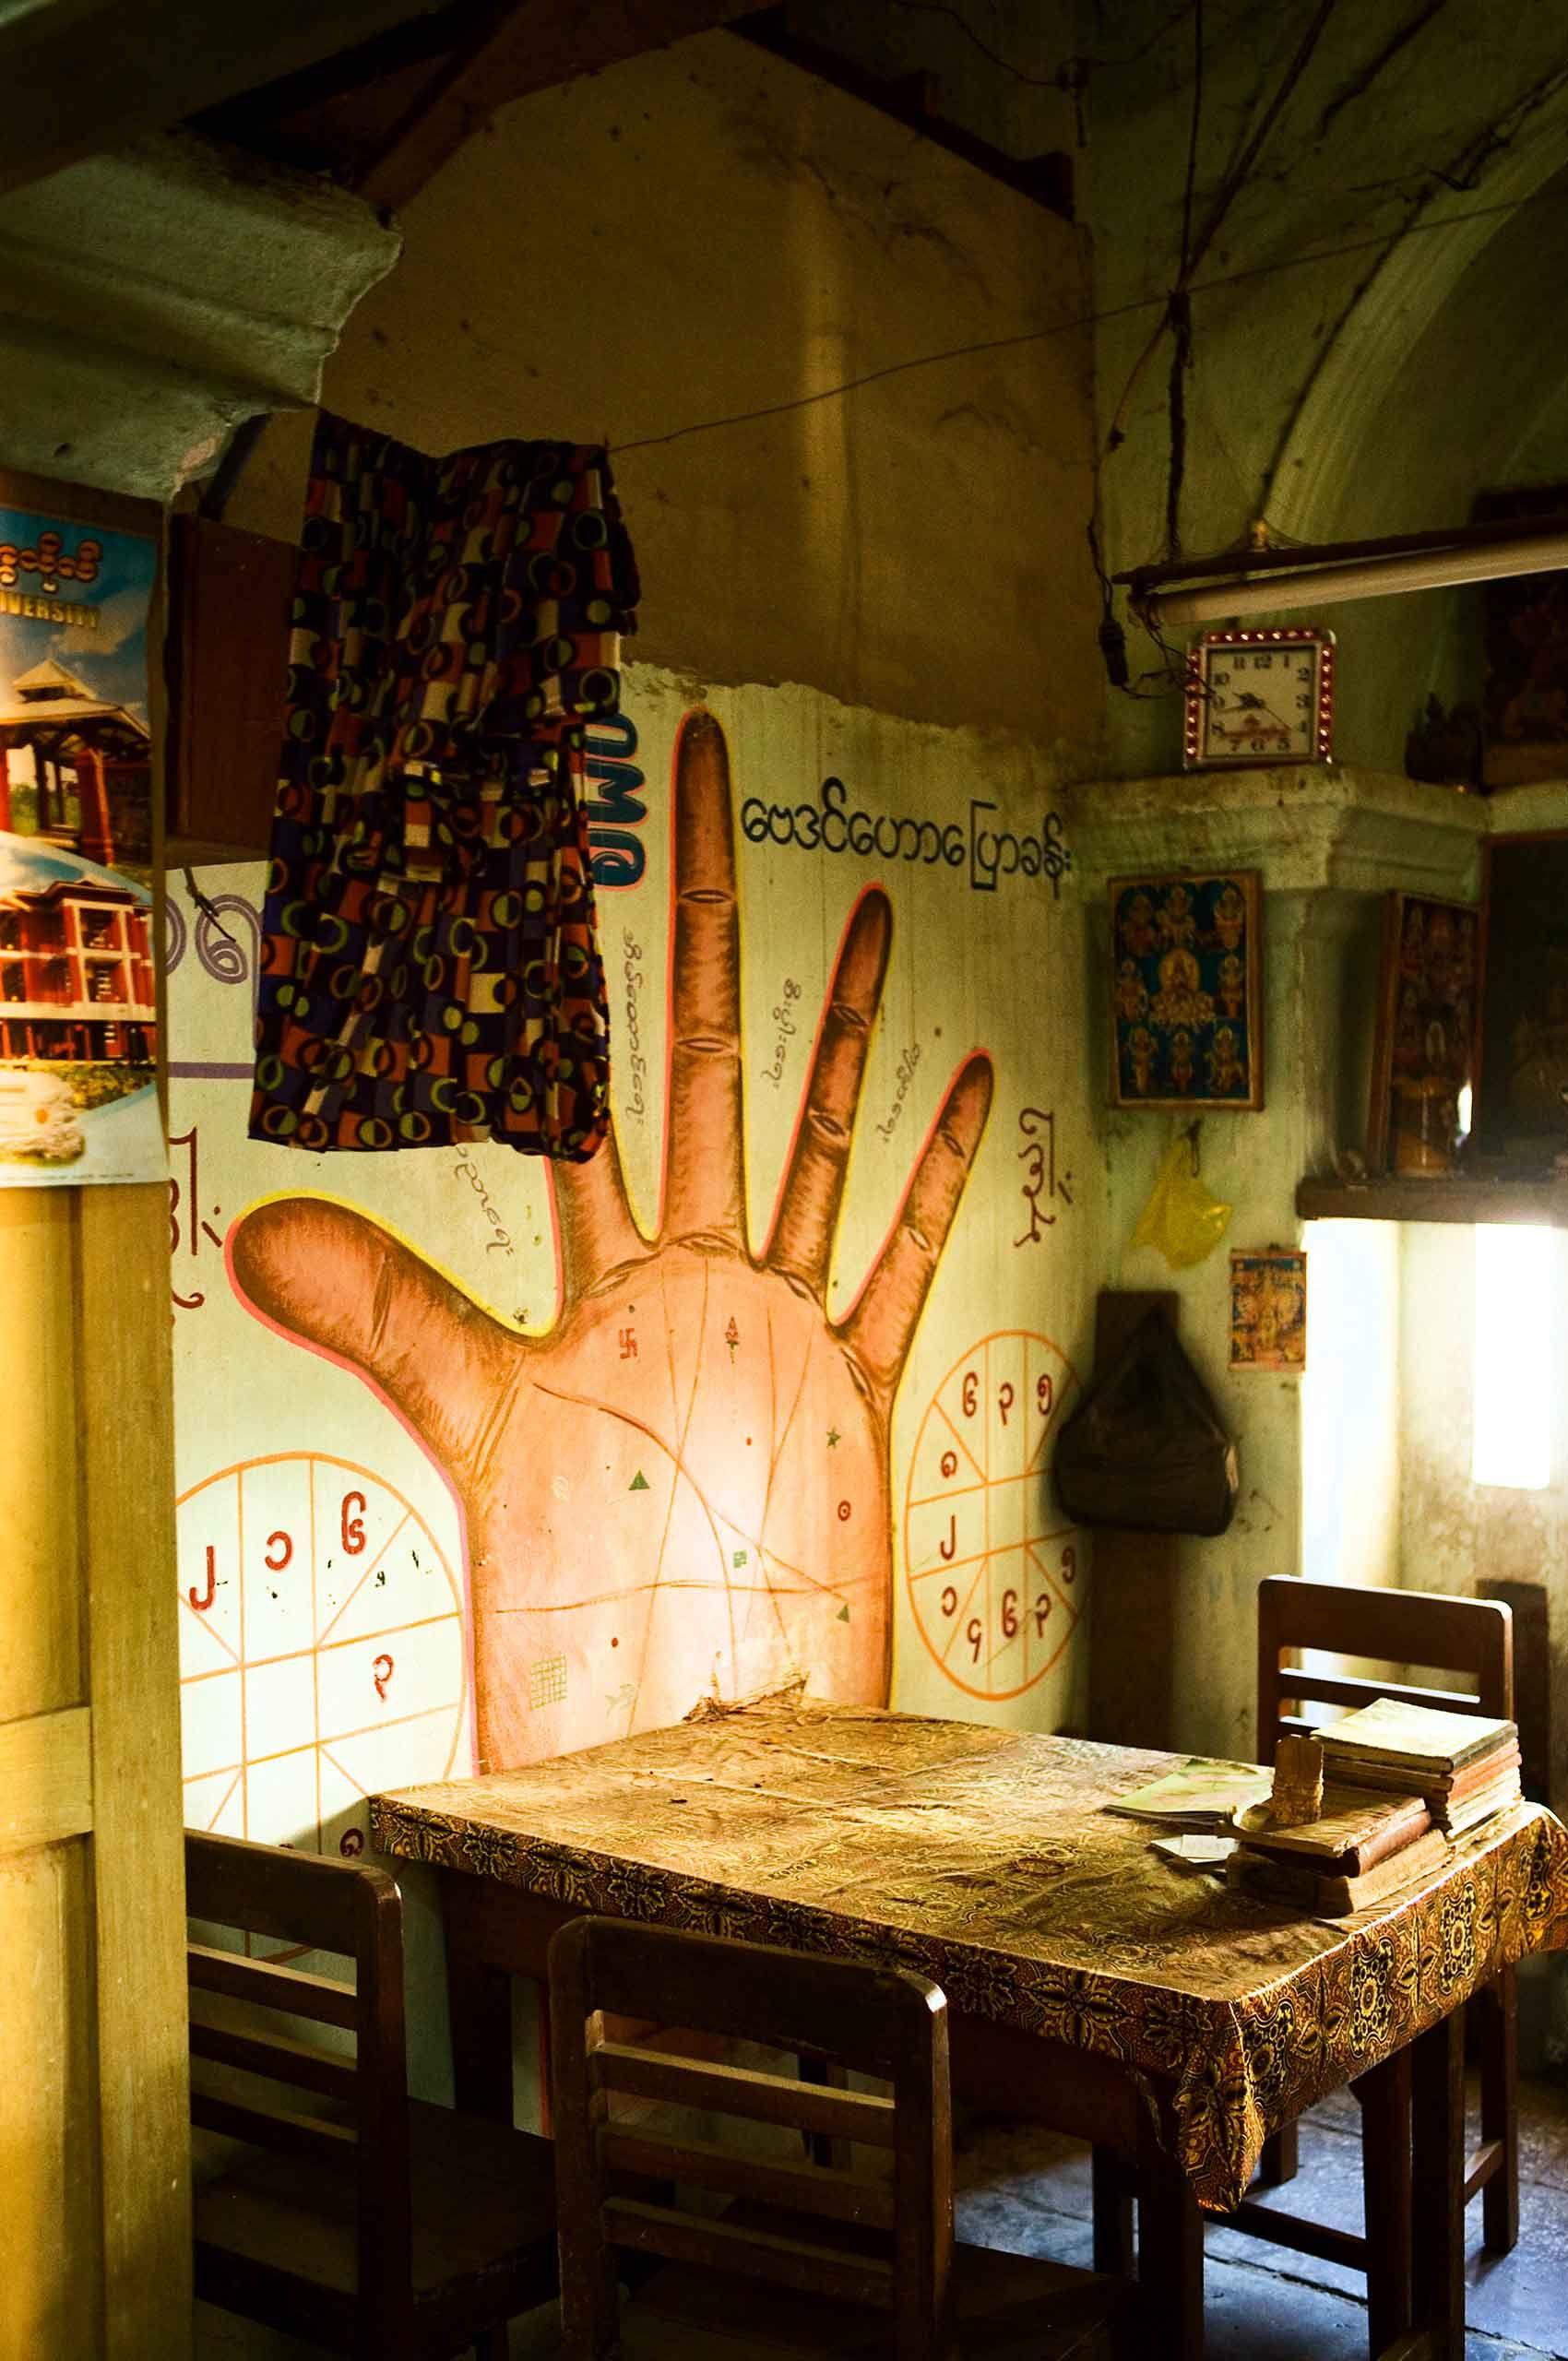 fortuneteller-myanmar-by-henrikolundphotography.jpg